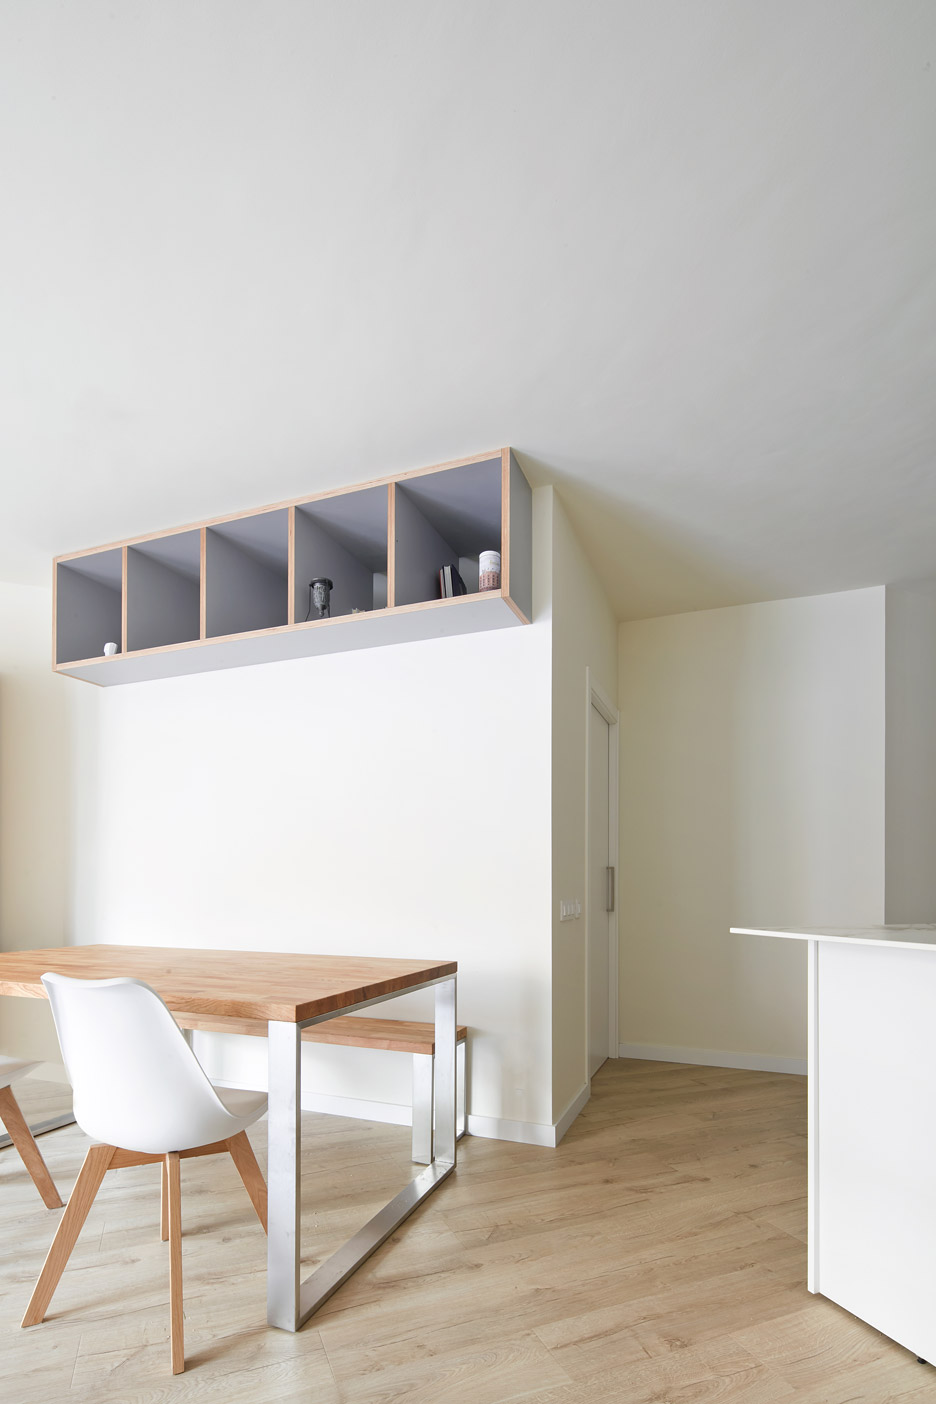 architecture_ open_layout__design_studia_interiors_osnovadesign_osnova_poltava_06